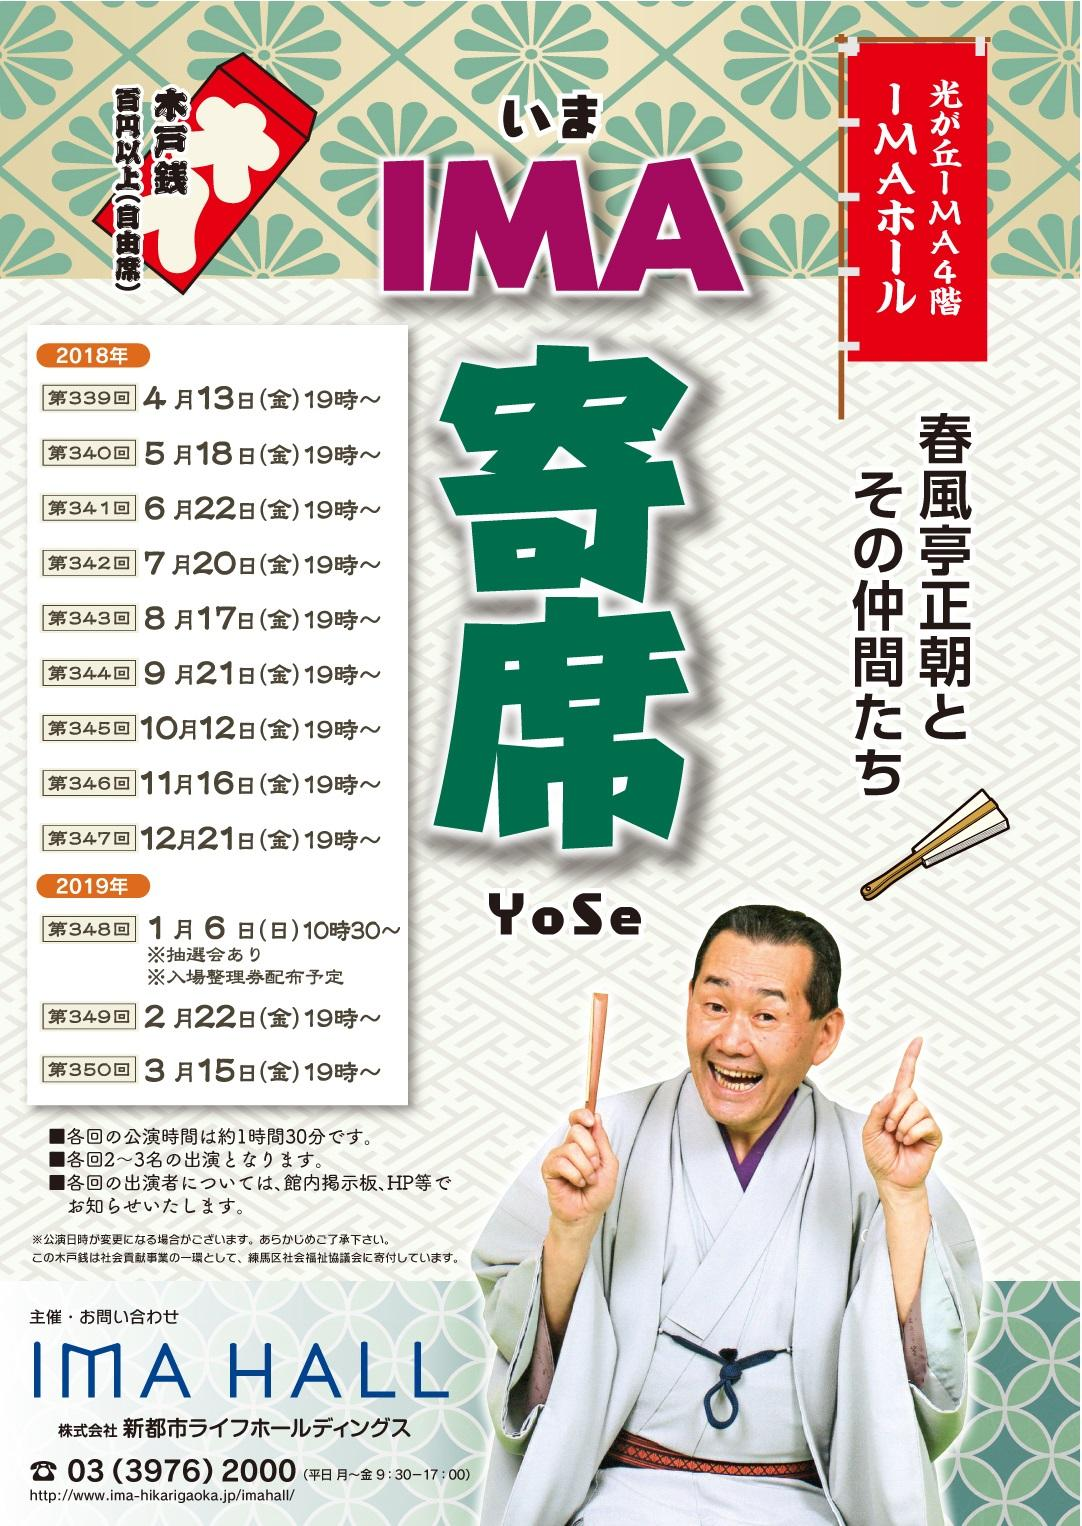 IMA variety hall